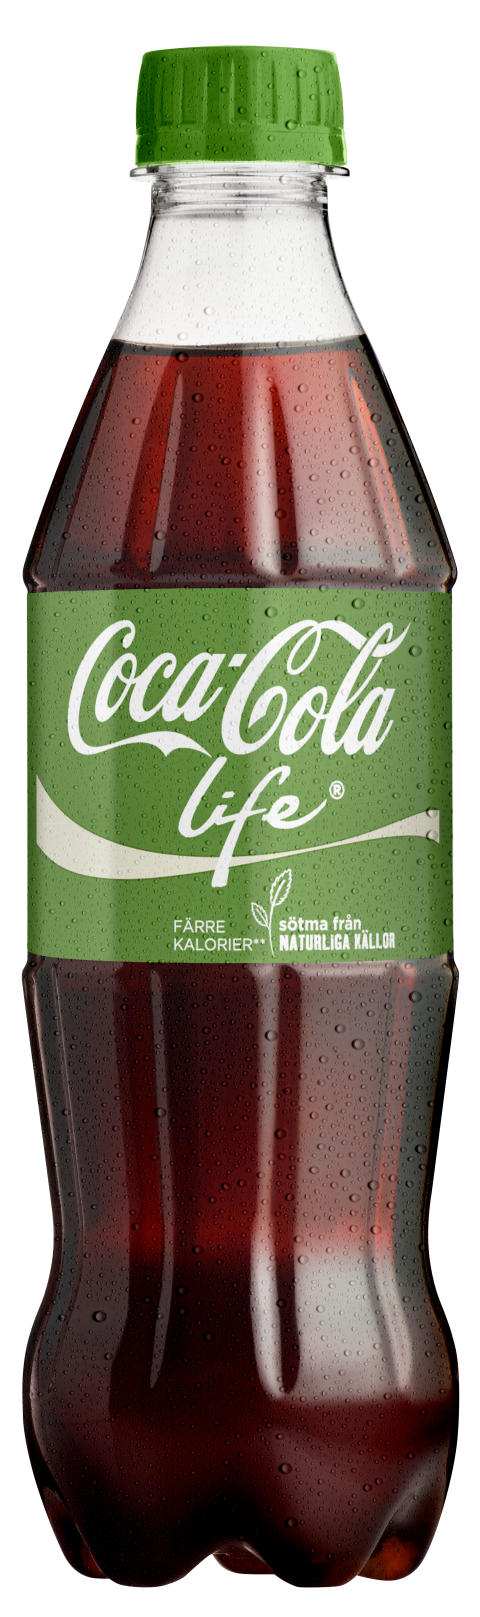 Coca-Cola life 0,5 liter